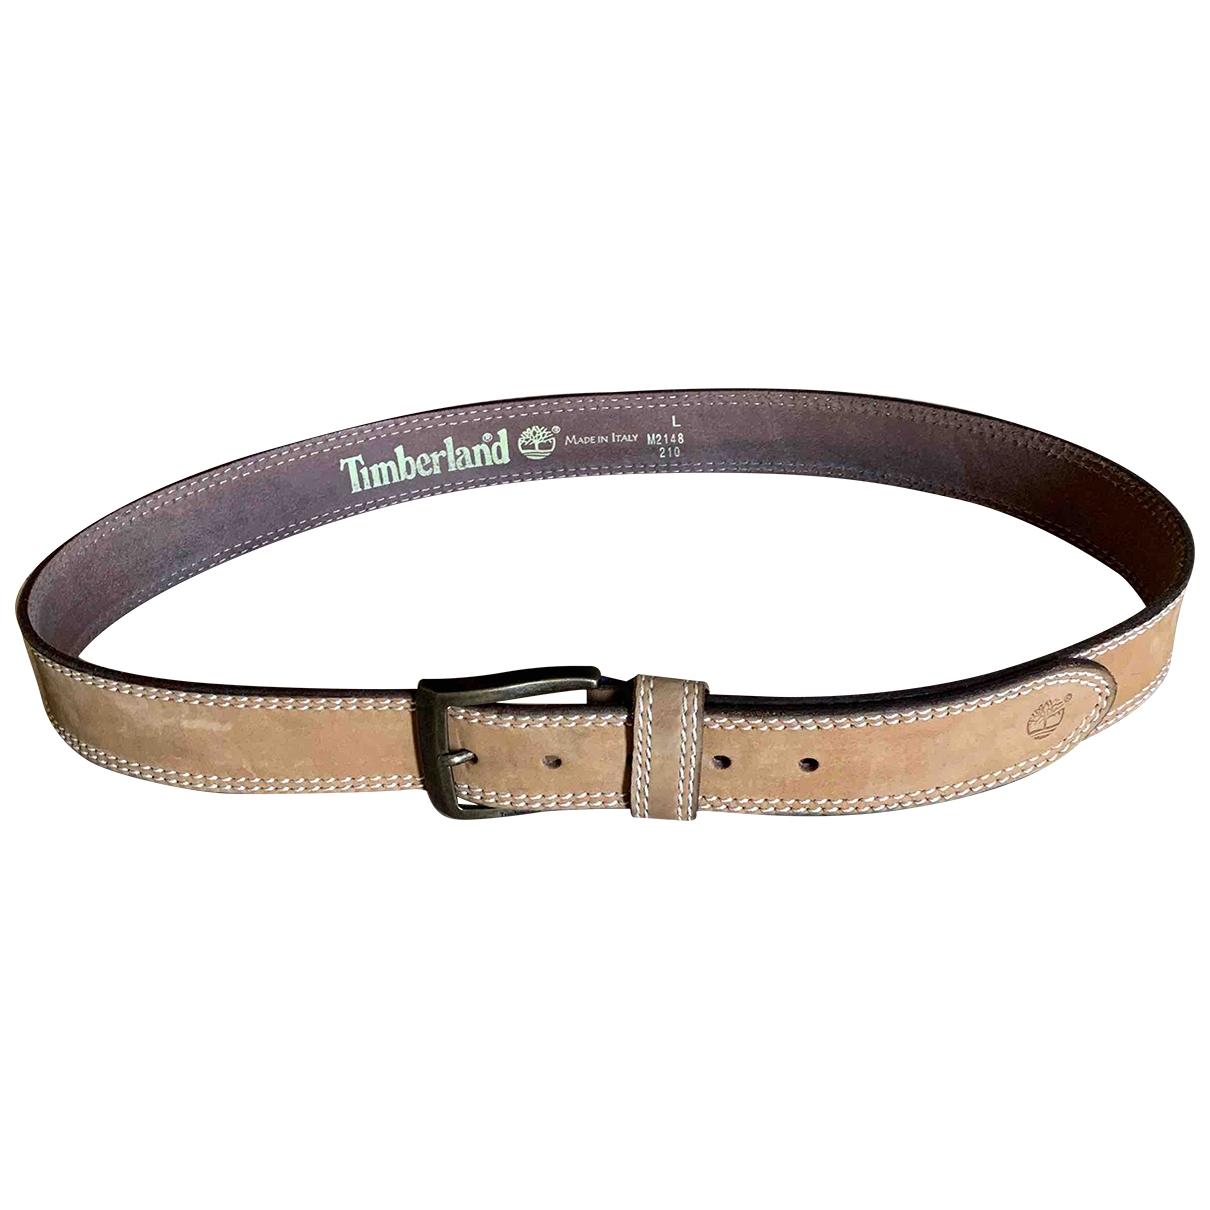 Timberland \N Ecru Leather belt for Men L international